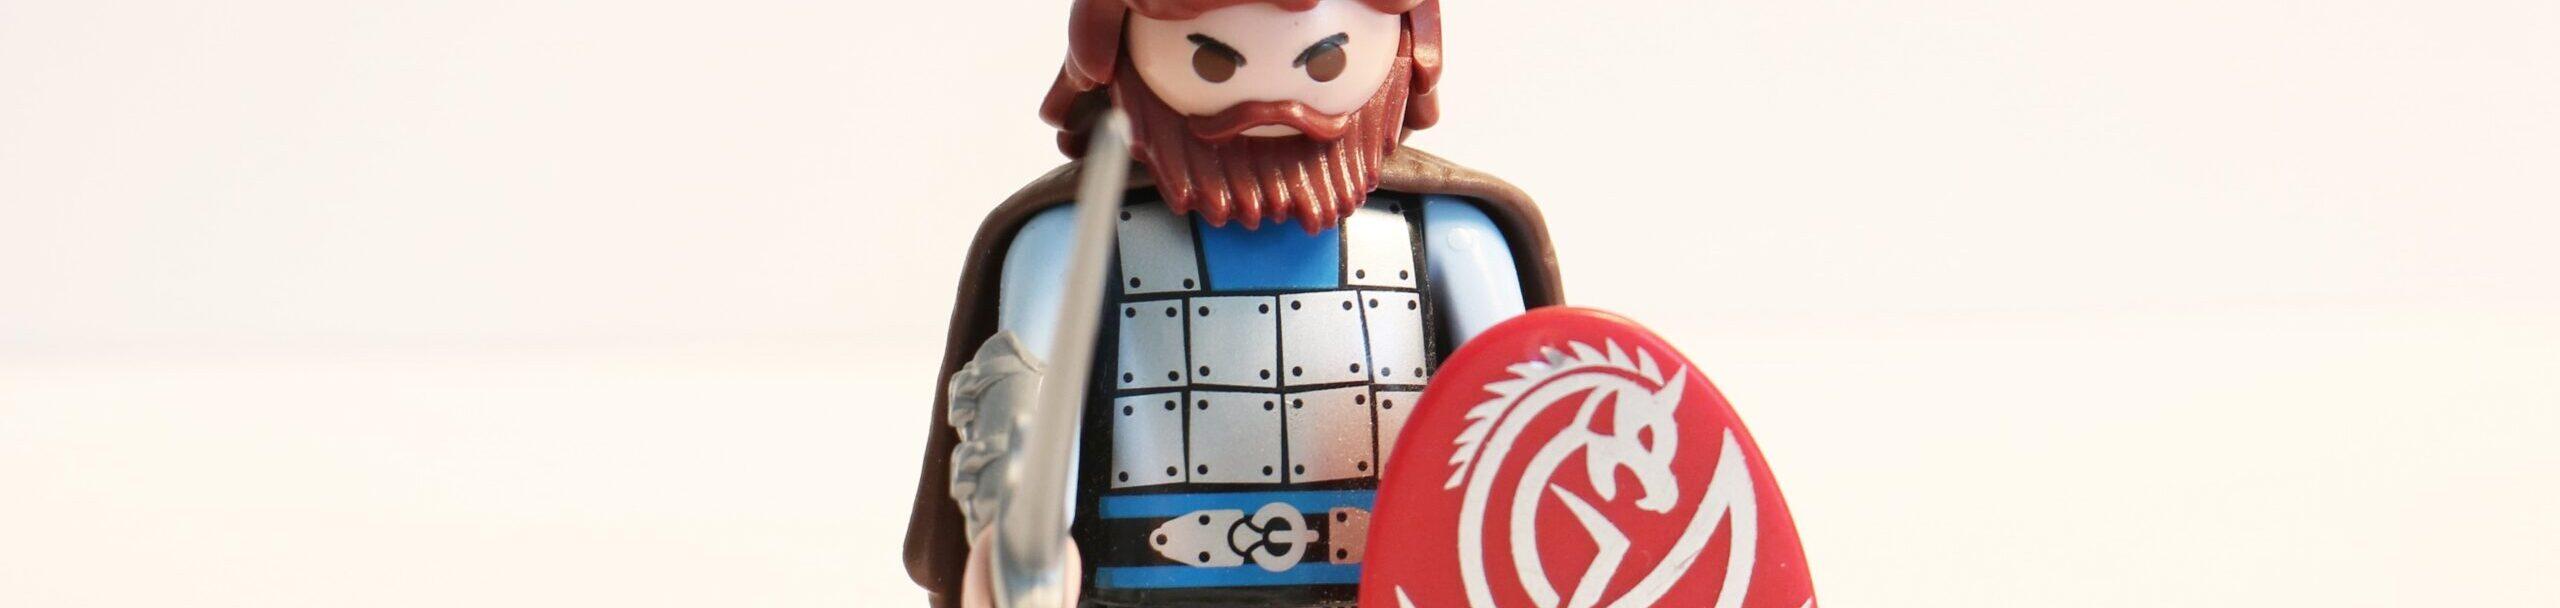 Lego knight - Rachel Writes blog 'Why should I use a freelance content writer or copywriter?'